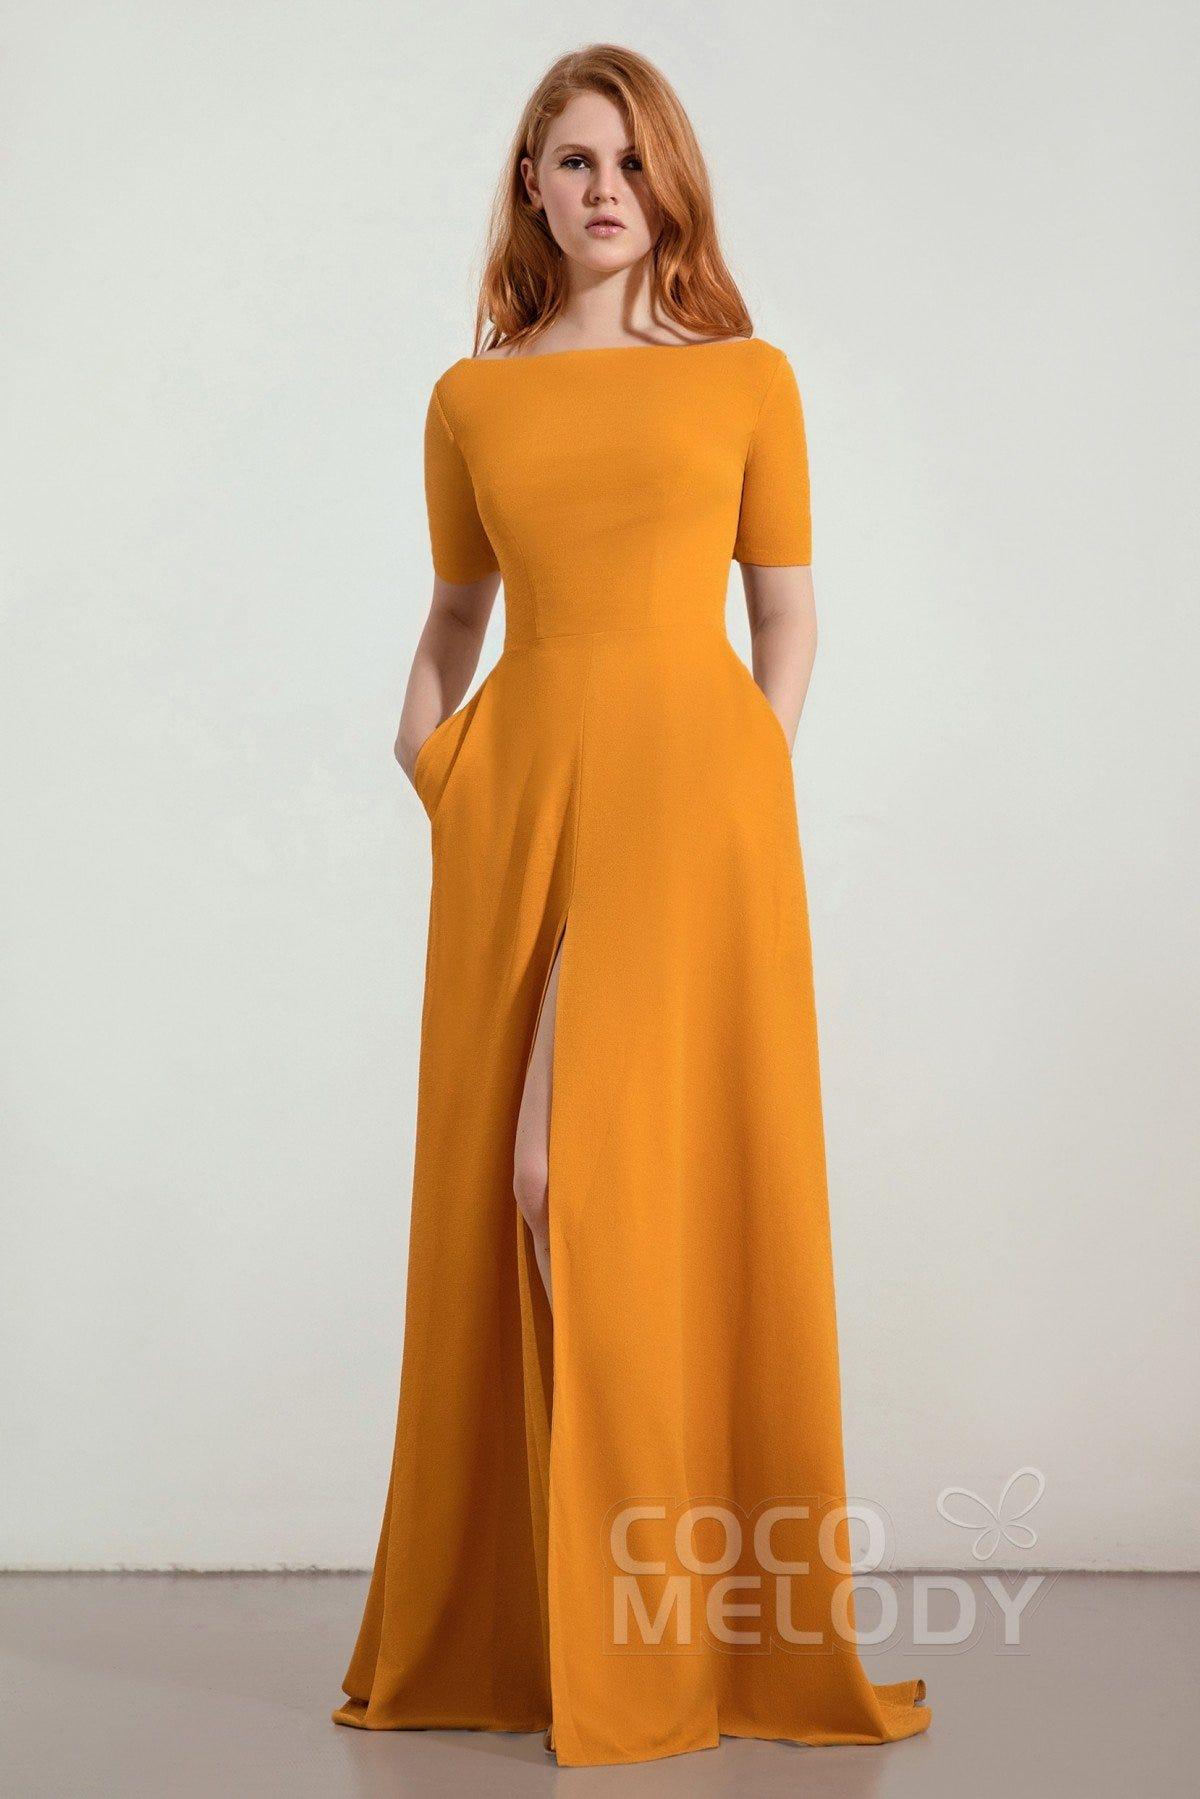 5f4c207d96cc Affordable Bridesmaid Dresses - Cheap Wedding Style